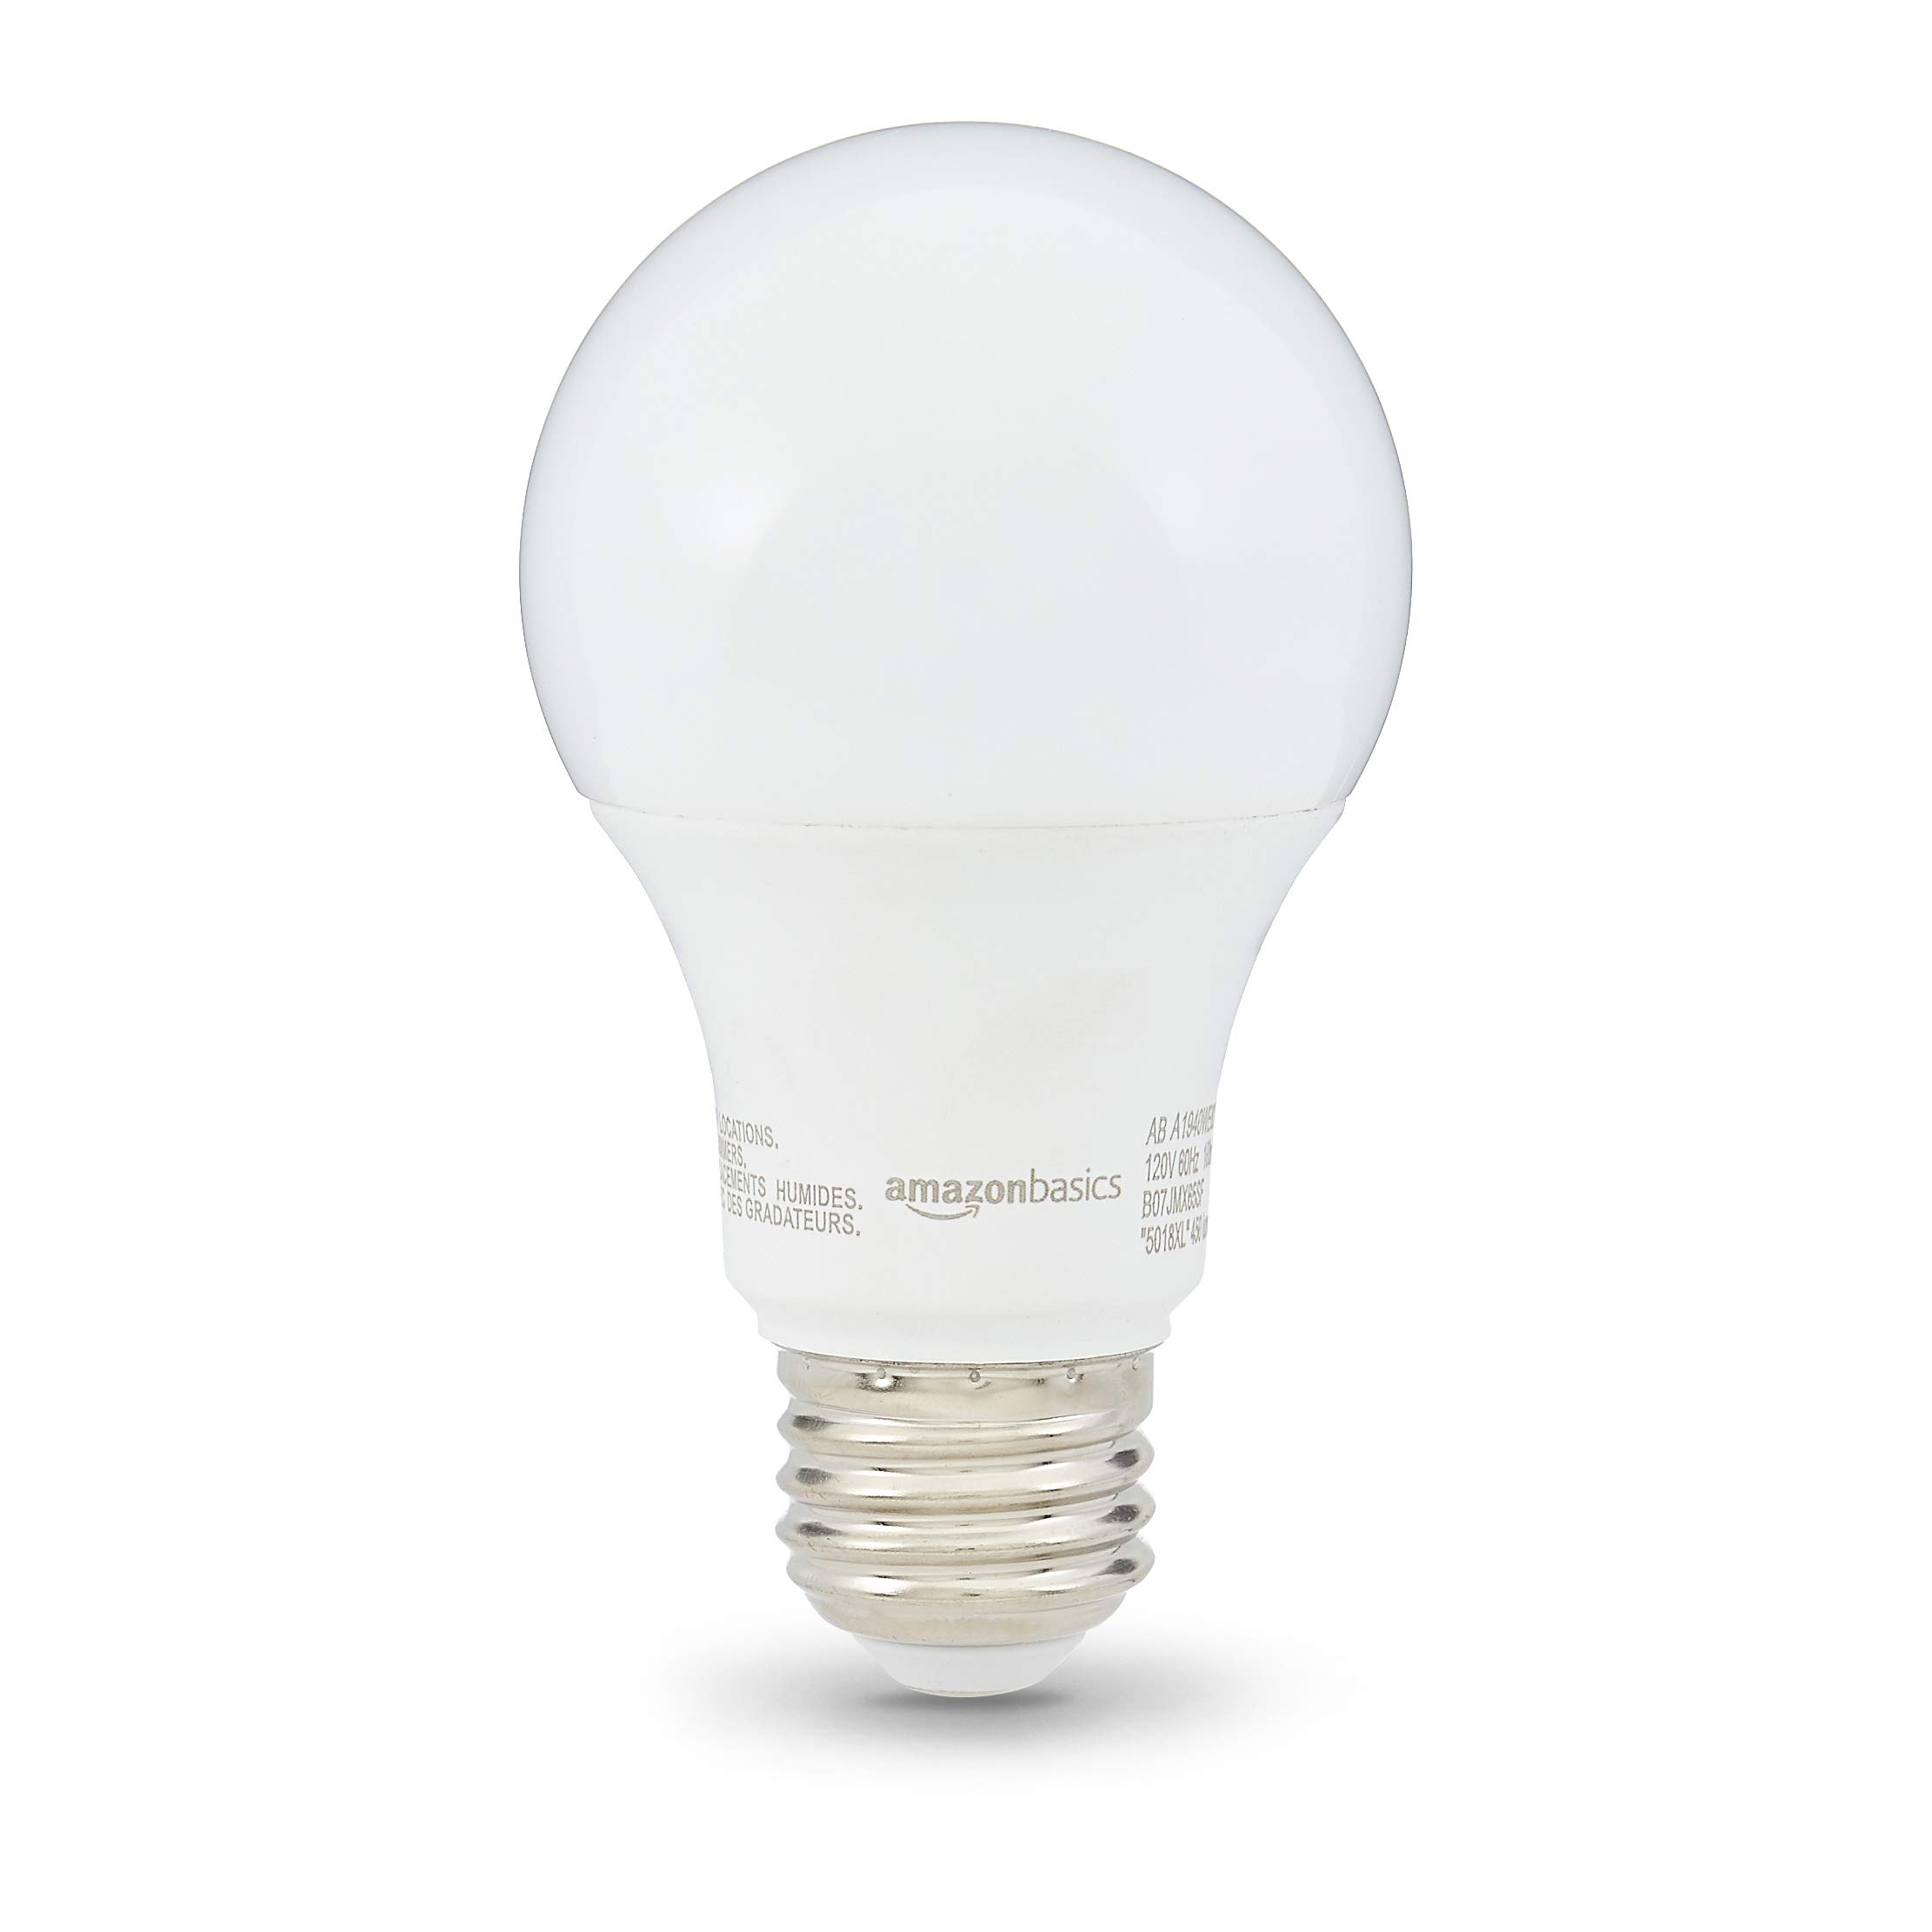 AmazonBasics 40W Equivalent, Soft White, Non-Dimmable, 10,000 Hour Lifetime, A19 LED Light Bulb | 6-Pack